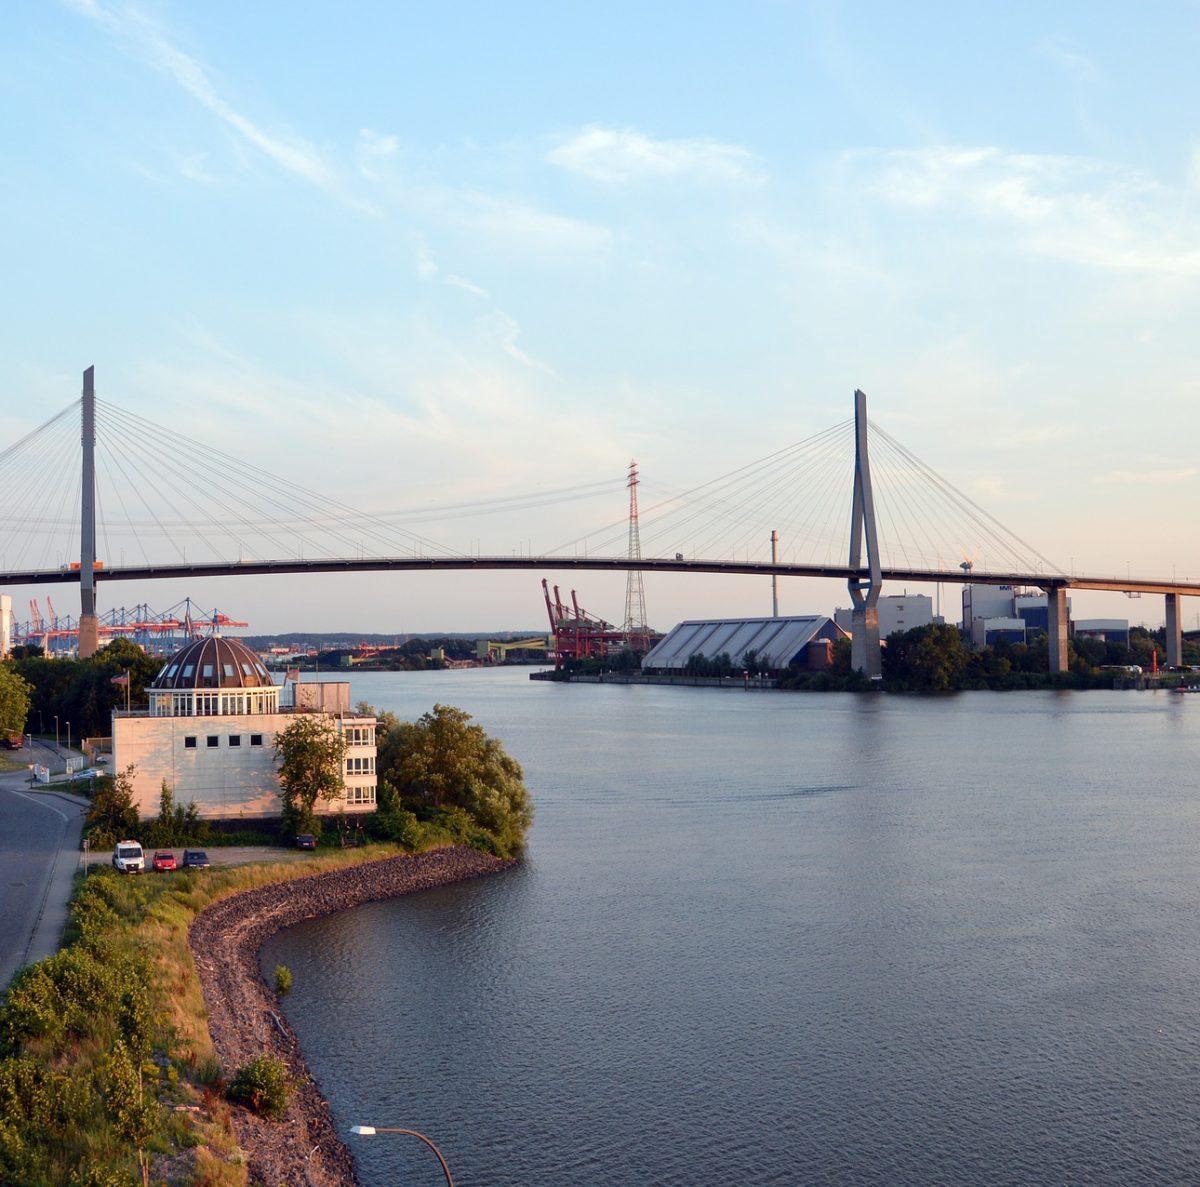 kohlbrand-bridge-3526691_1920